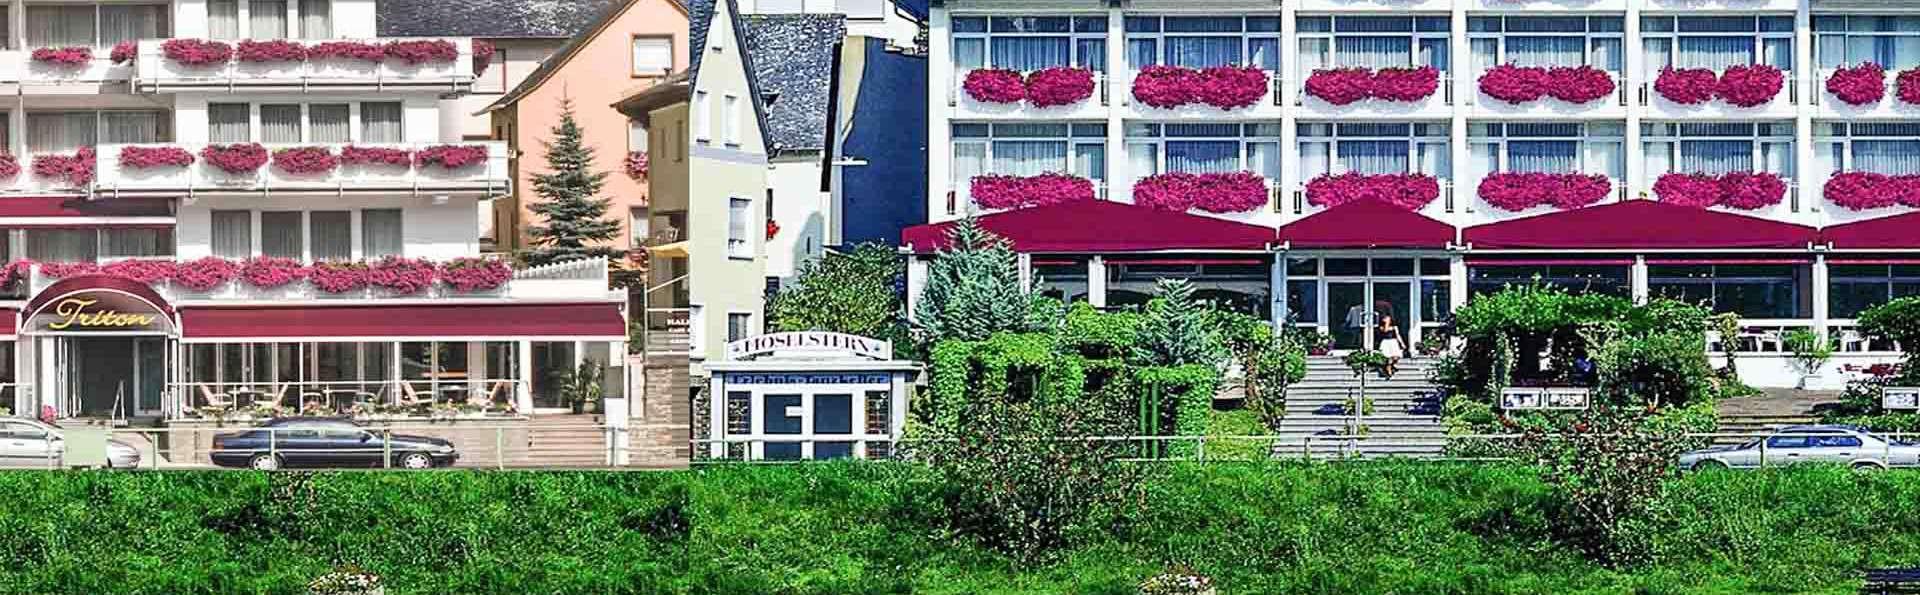 Moselstern**** Hotel Brixiade & Triton - EDIT_Moselstern_Hotel_Brixiade-Triton_01.jpg